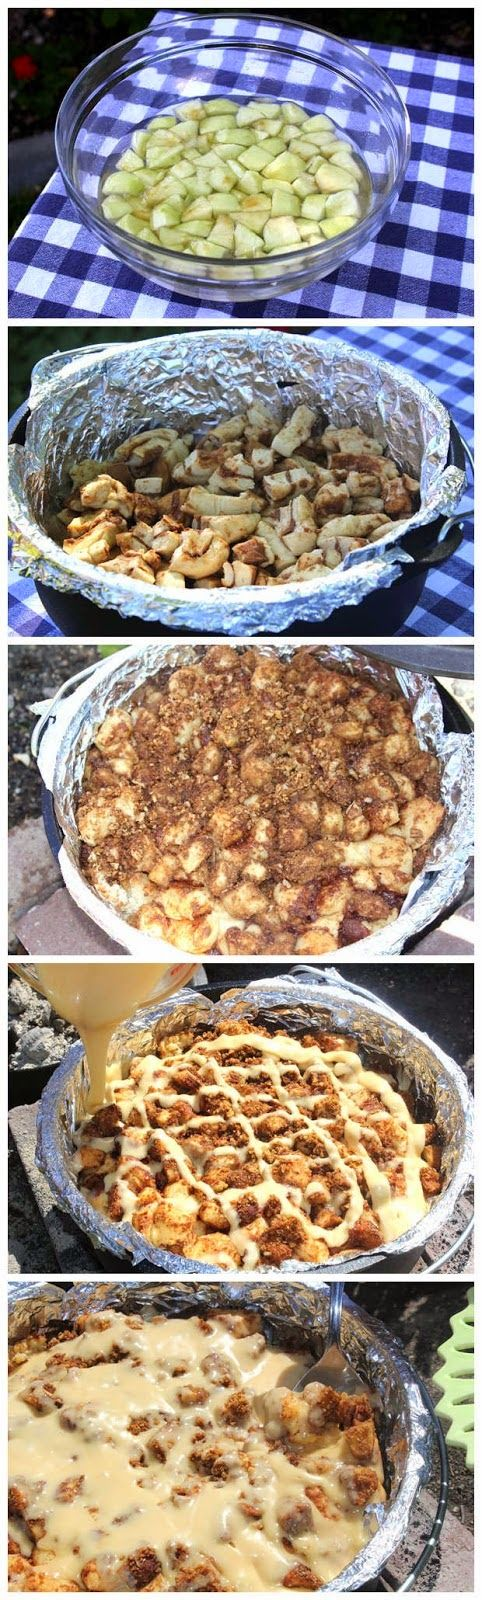 Dutch Oven Caramel Apple Pie